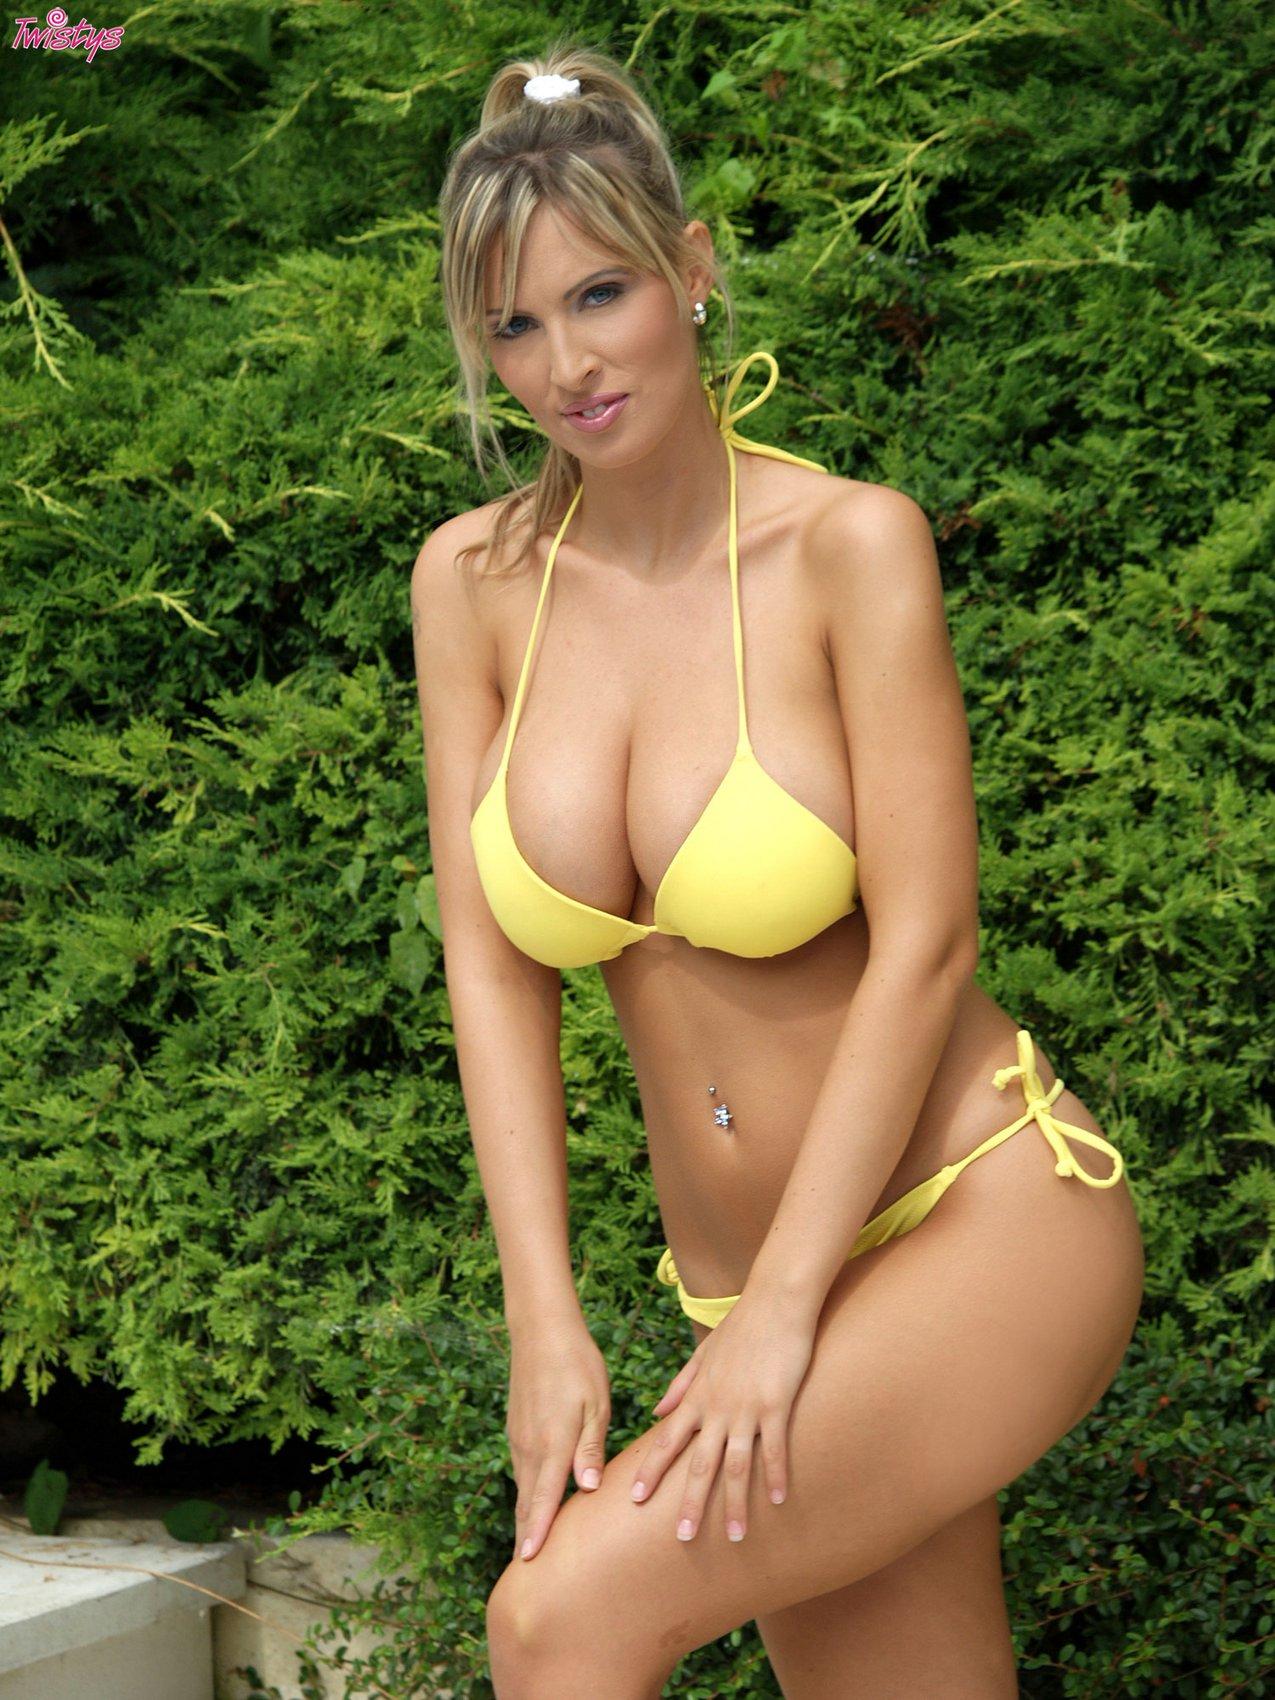 little girl milly bikini